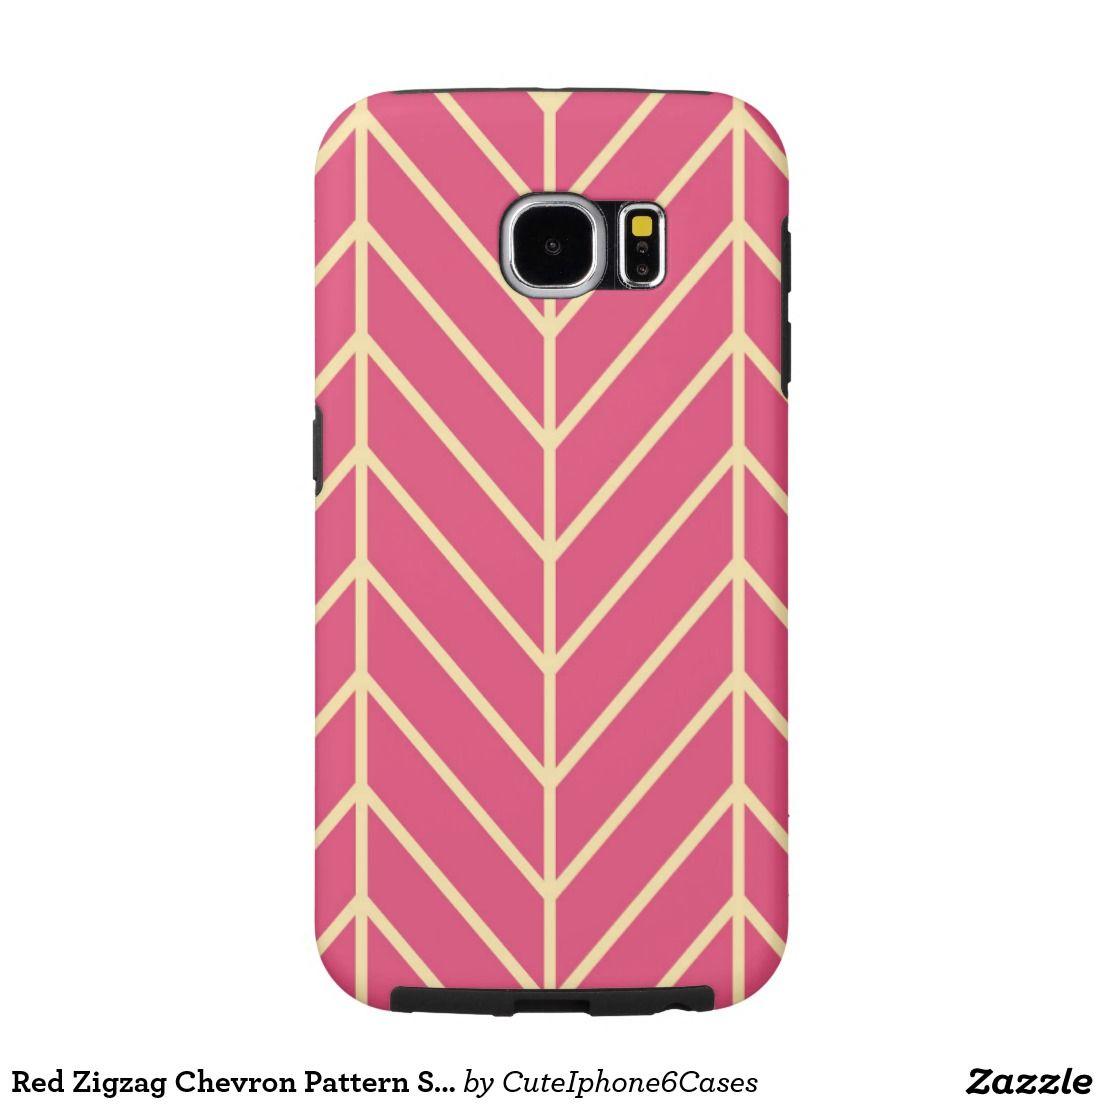 Red Zigzag Chevron Pattern Samsung Galaxy S6 Case Samsung Galaxy S6 Cases